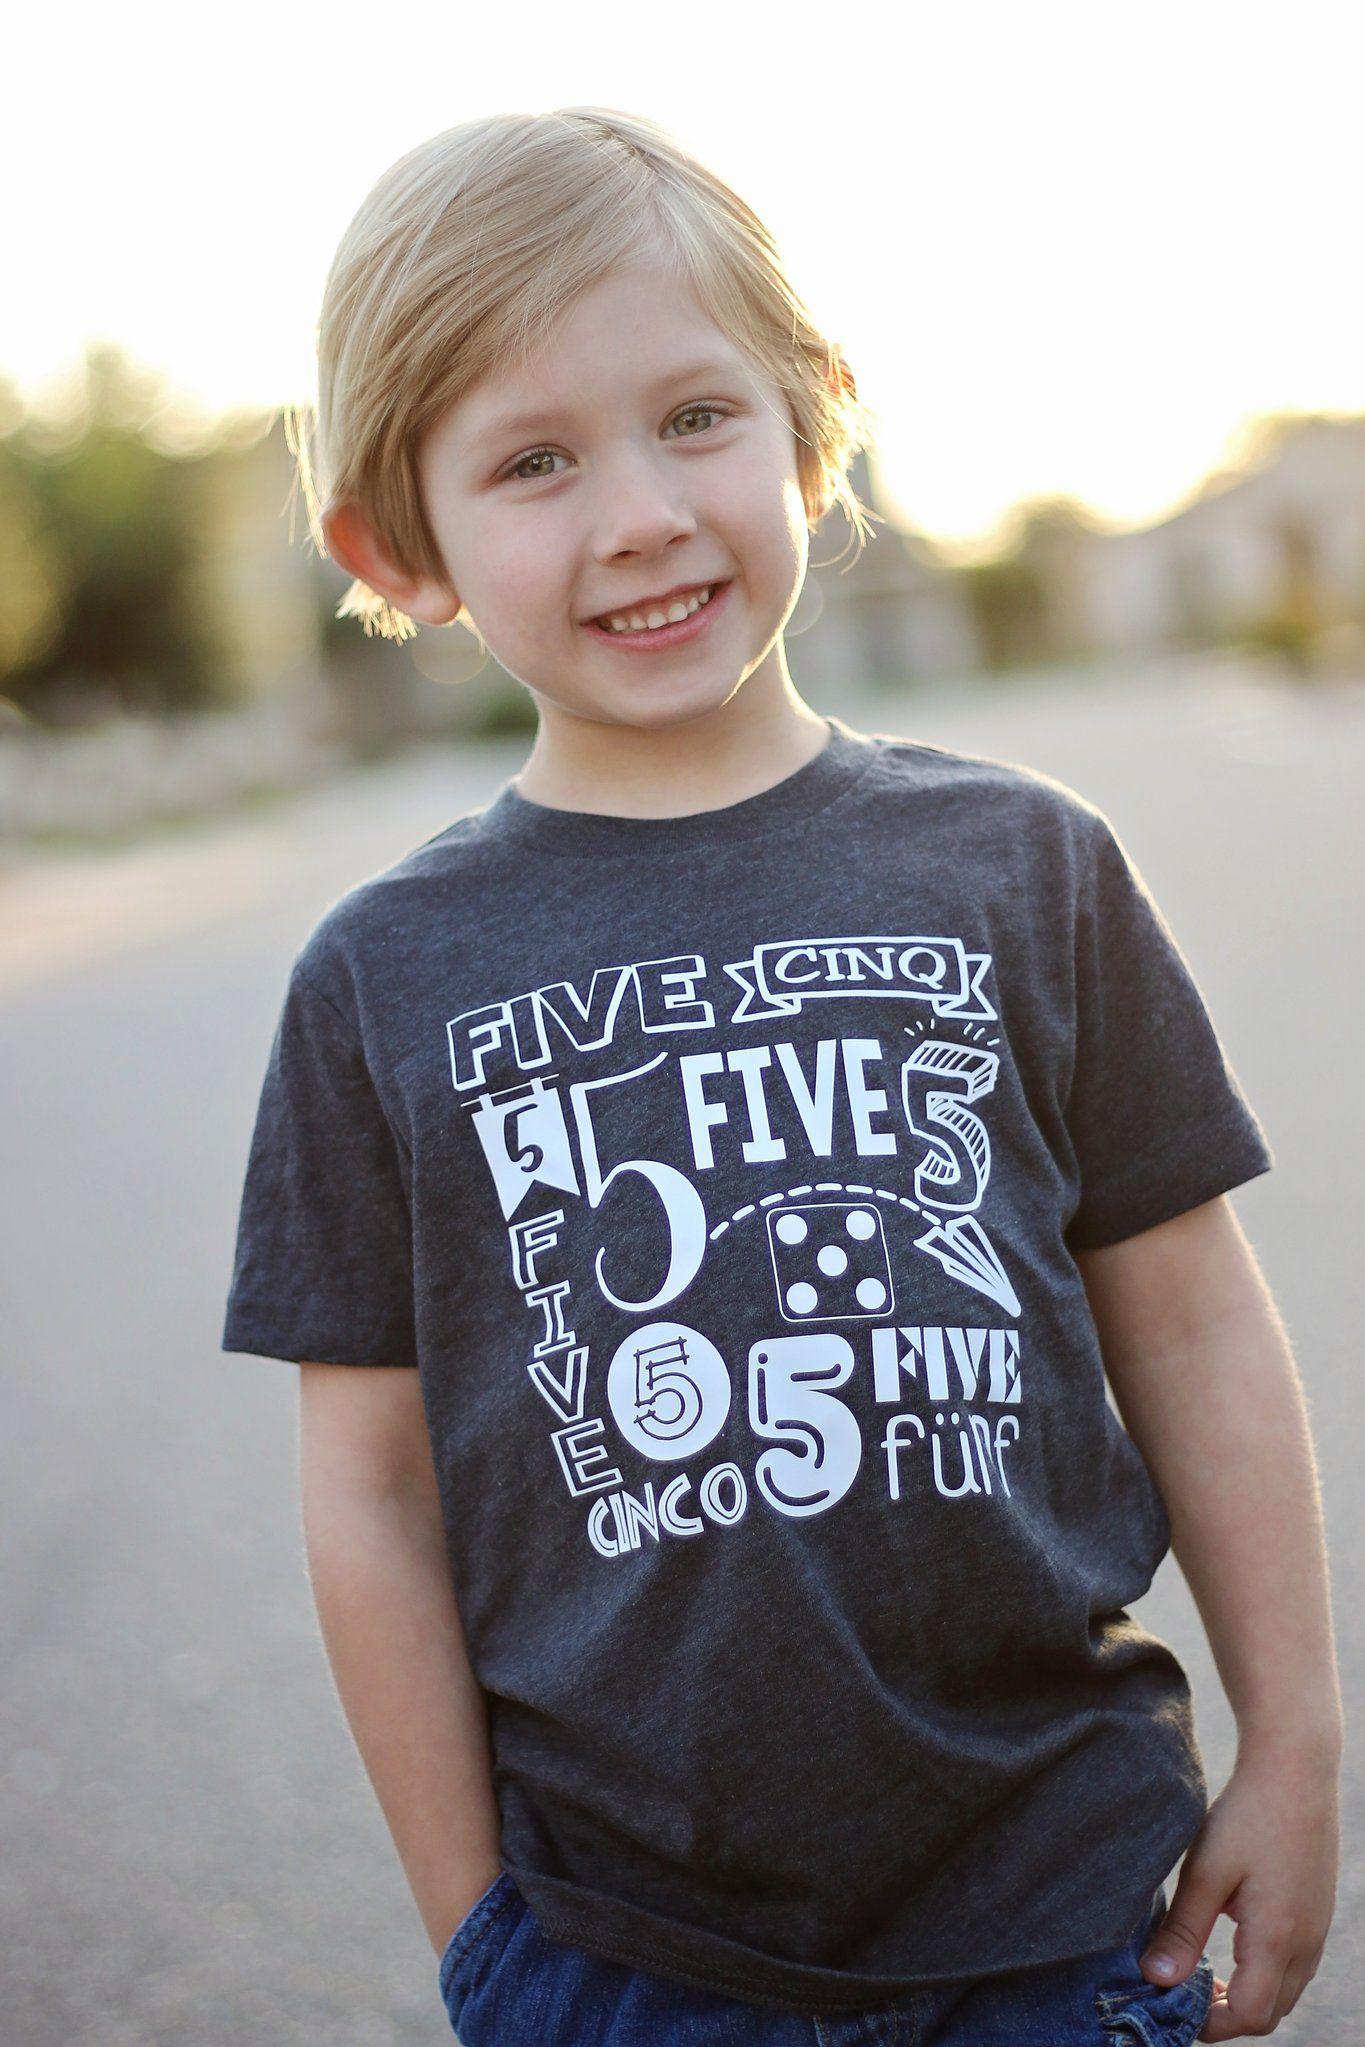 5th birthdaymy year boys childrens t shirt 5th